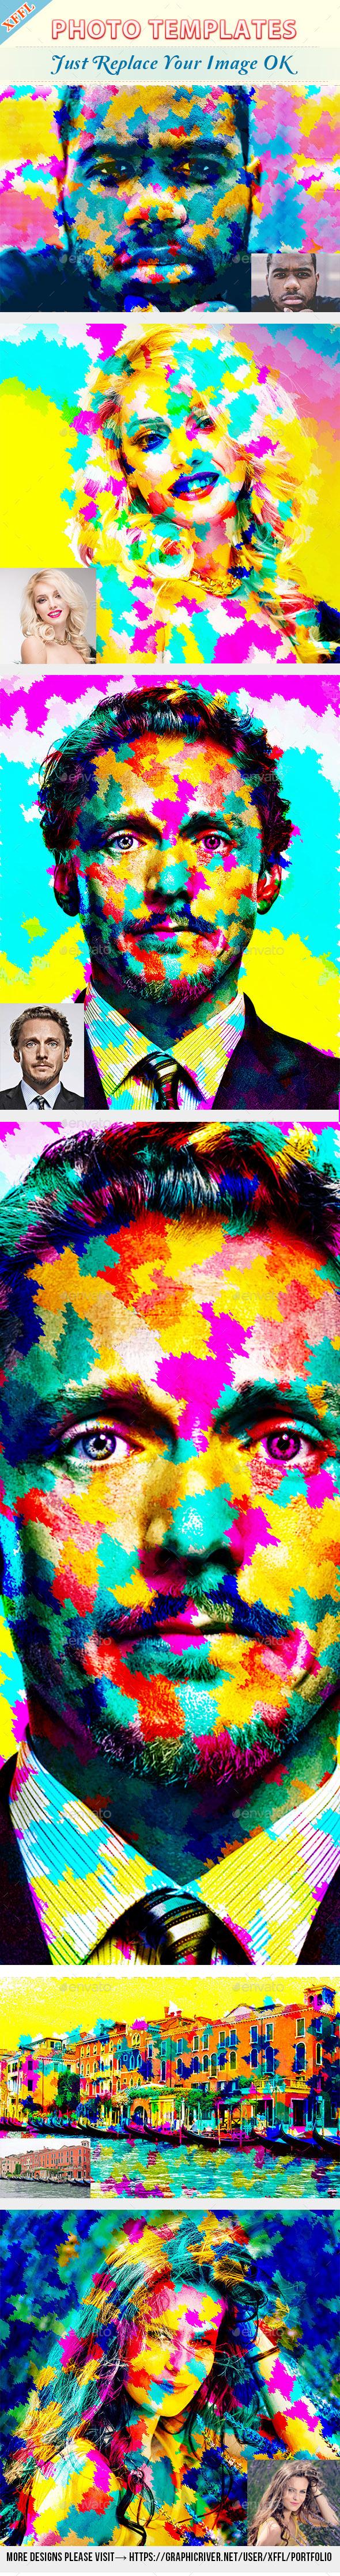 Colourful Paint Photo Template - Artistic Photo Templates